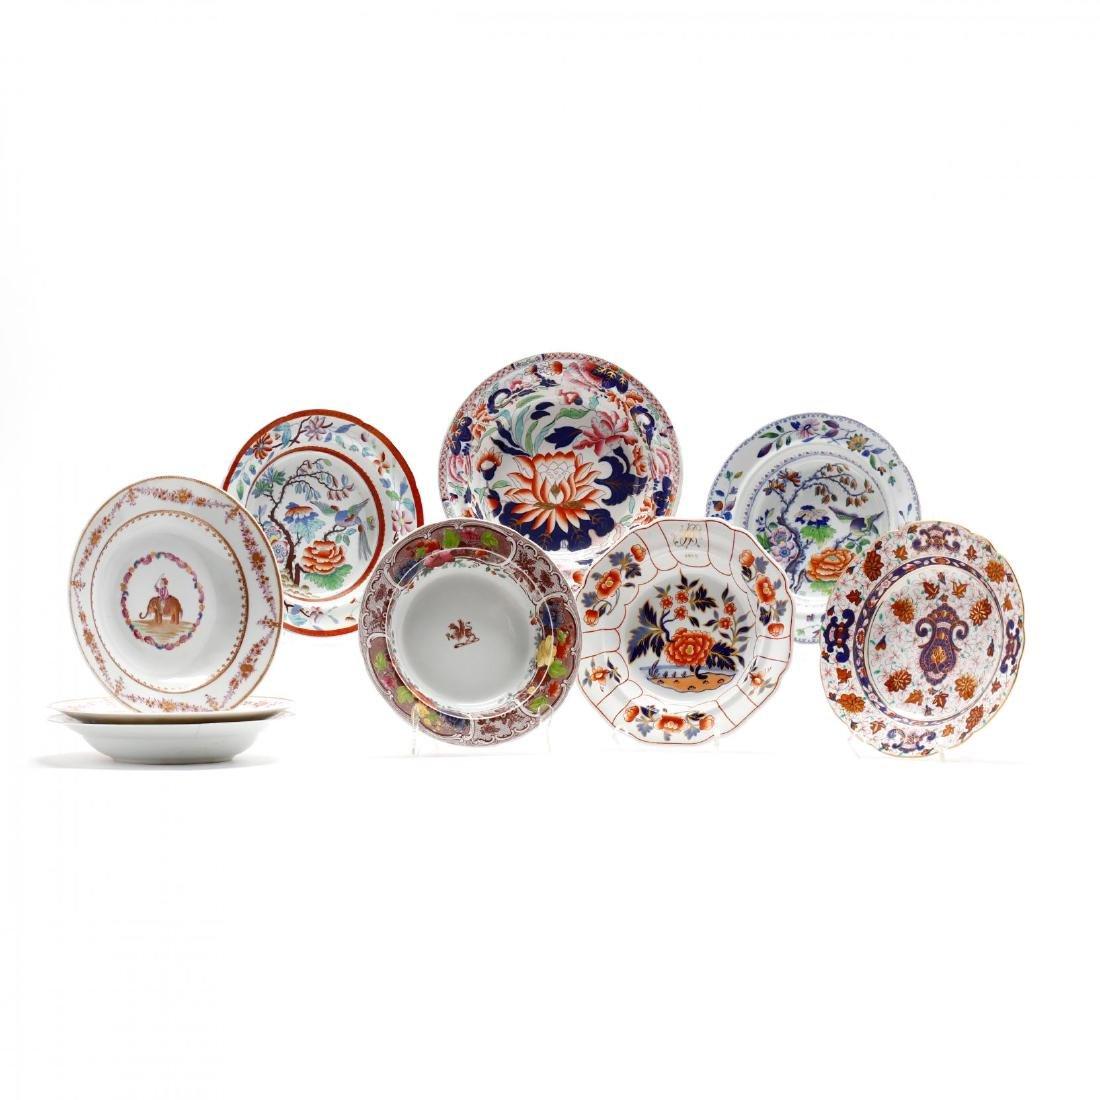 A Collection of Antique Soup Bowls